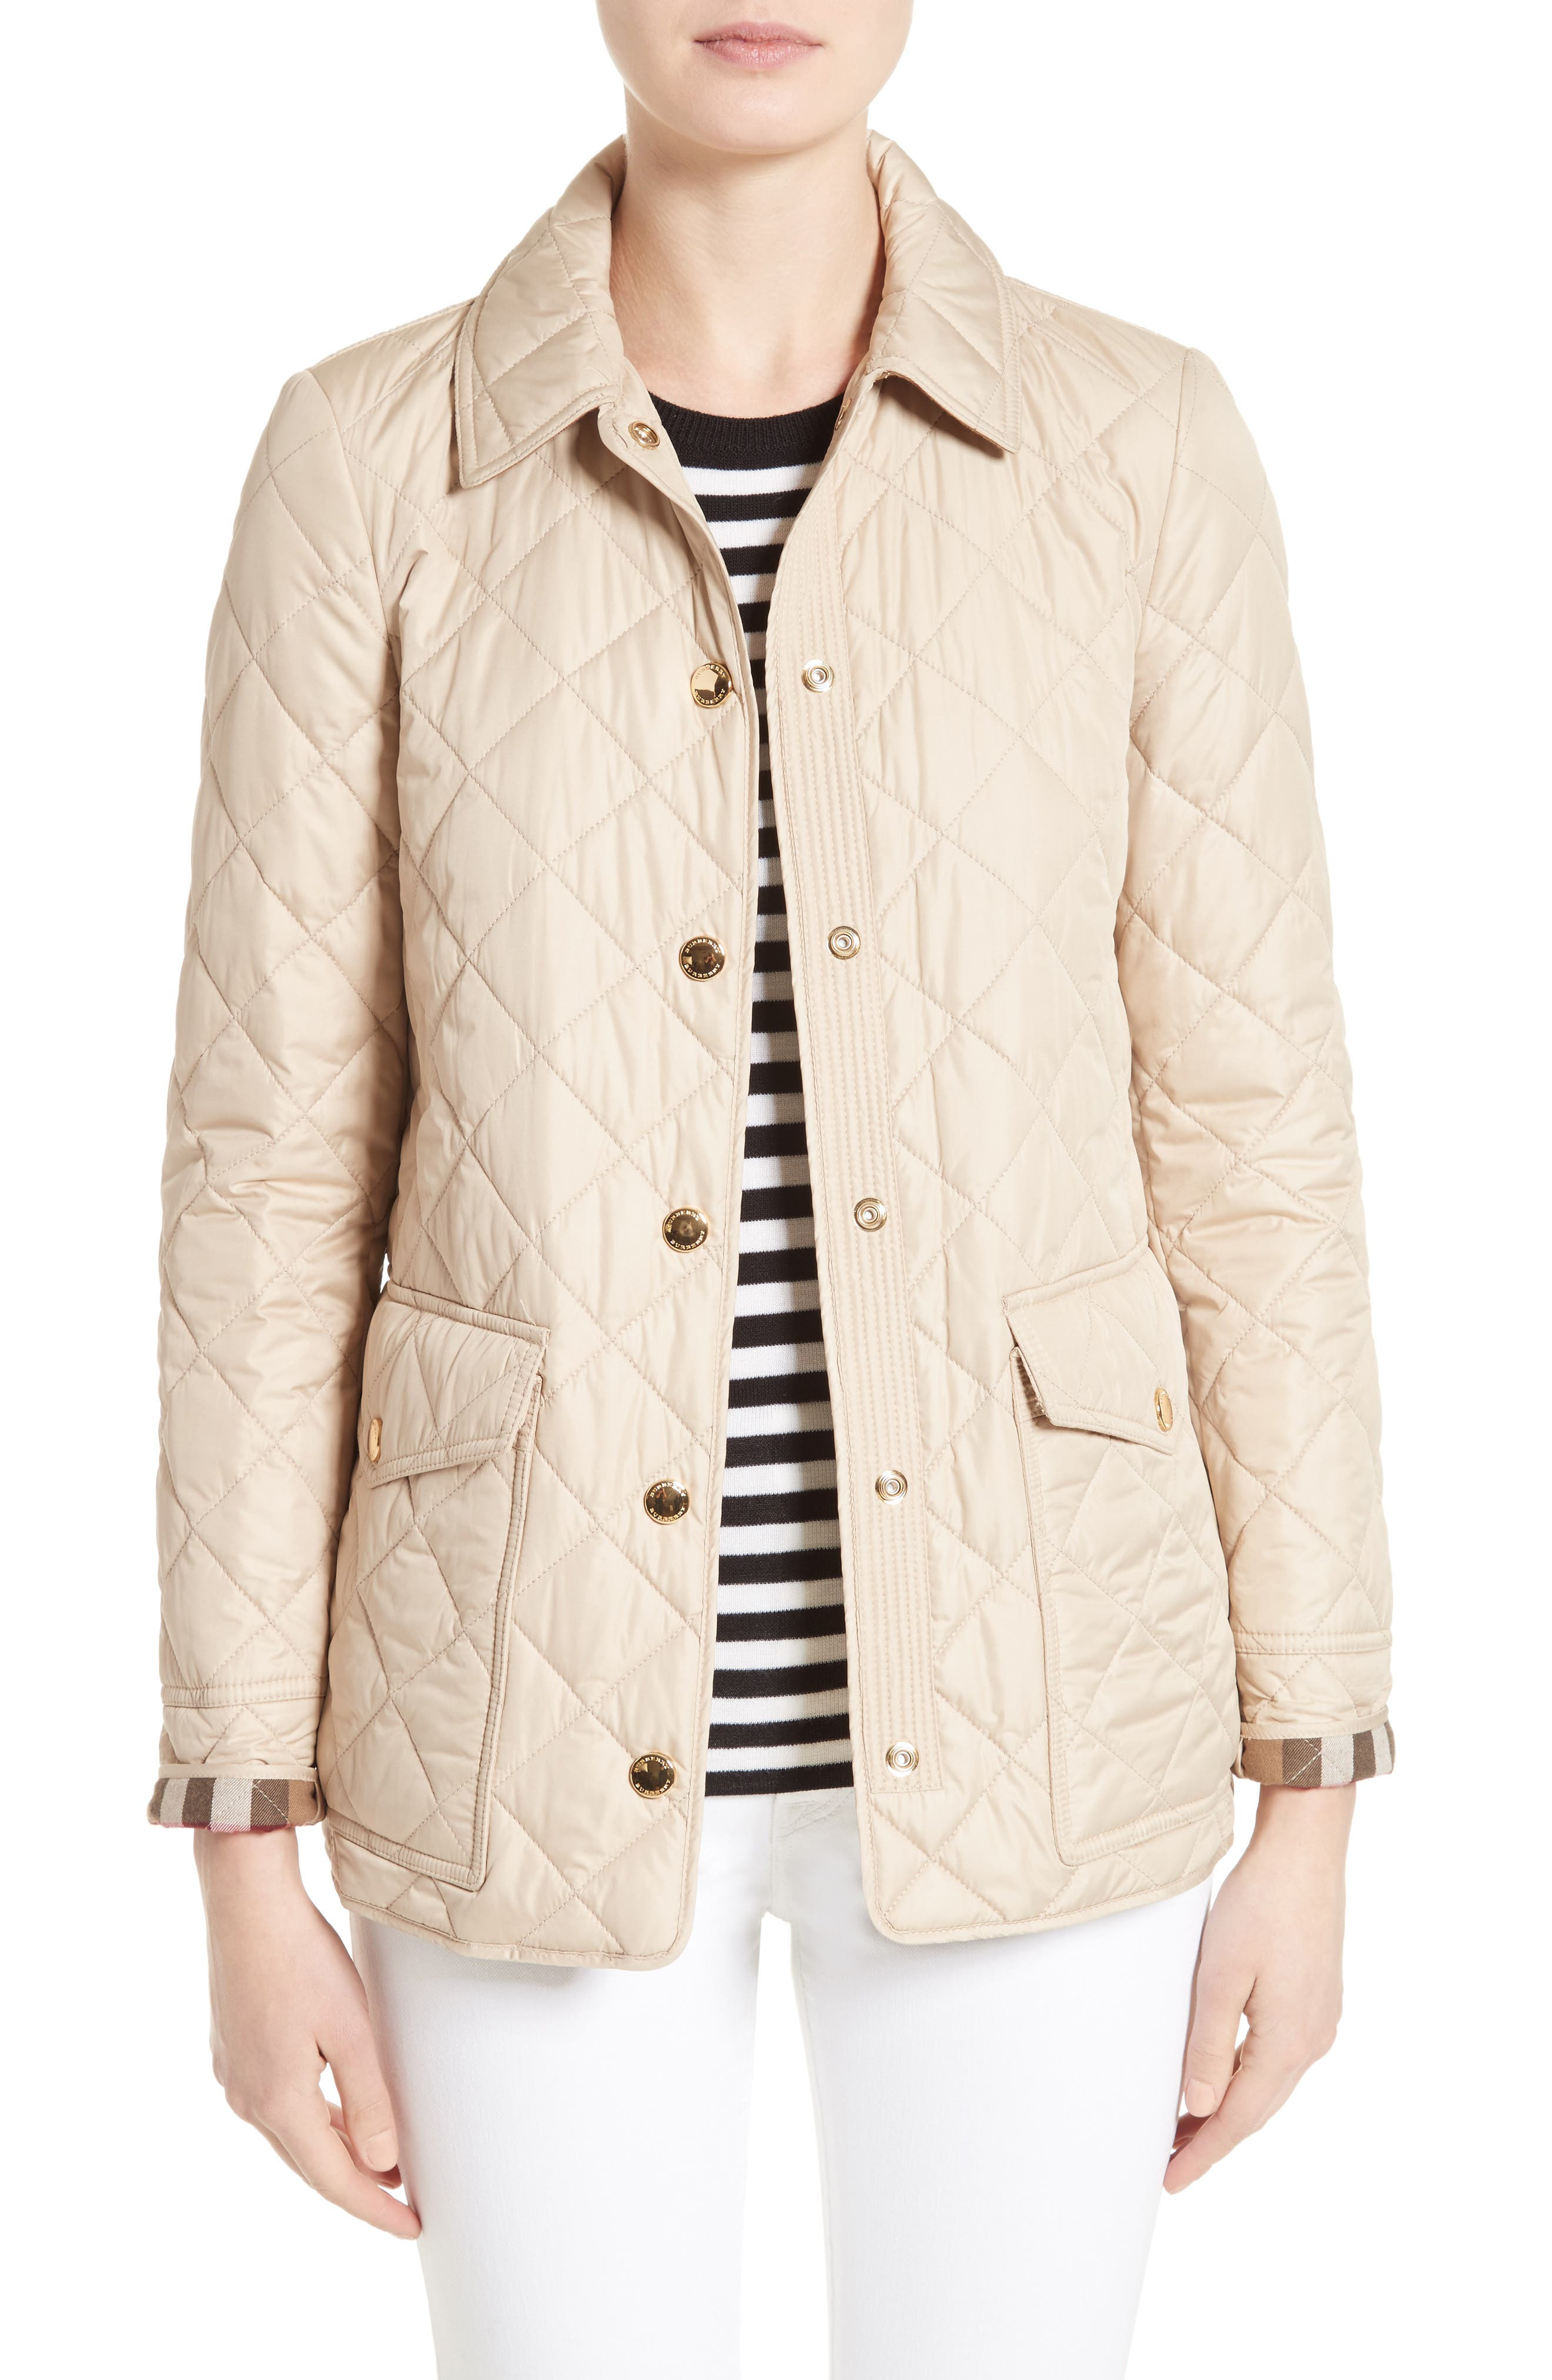 Alternate Image 1 Selected - Burberry Westbridge Quilted Jacket